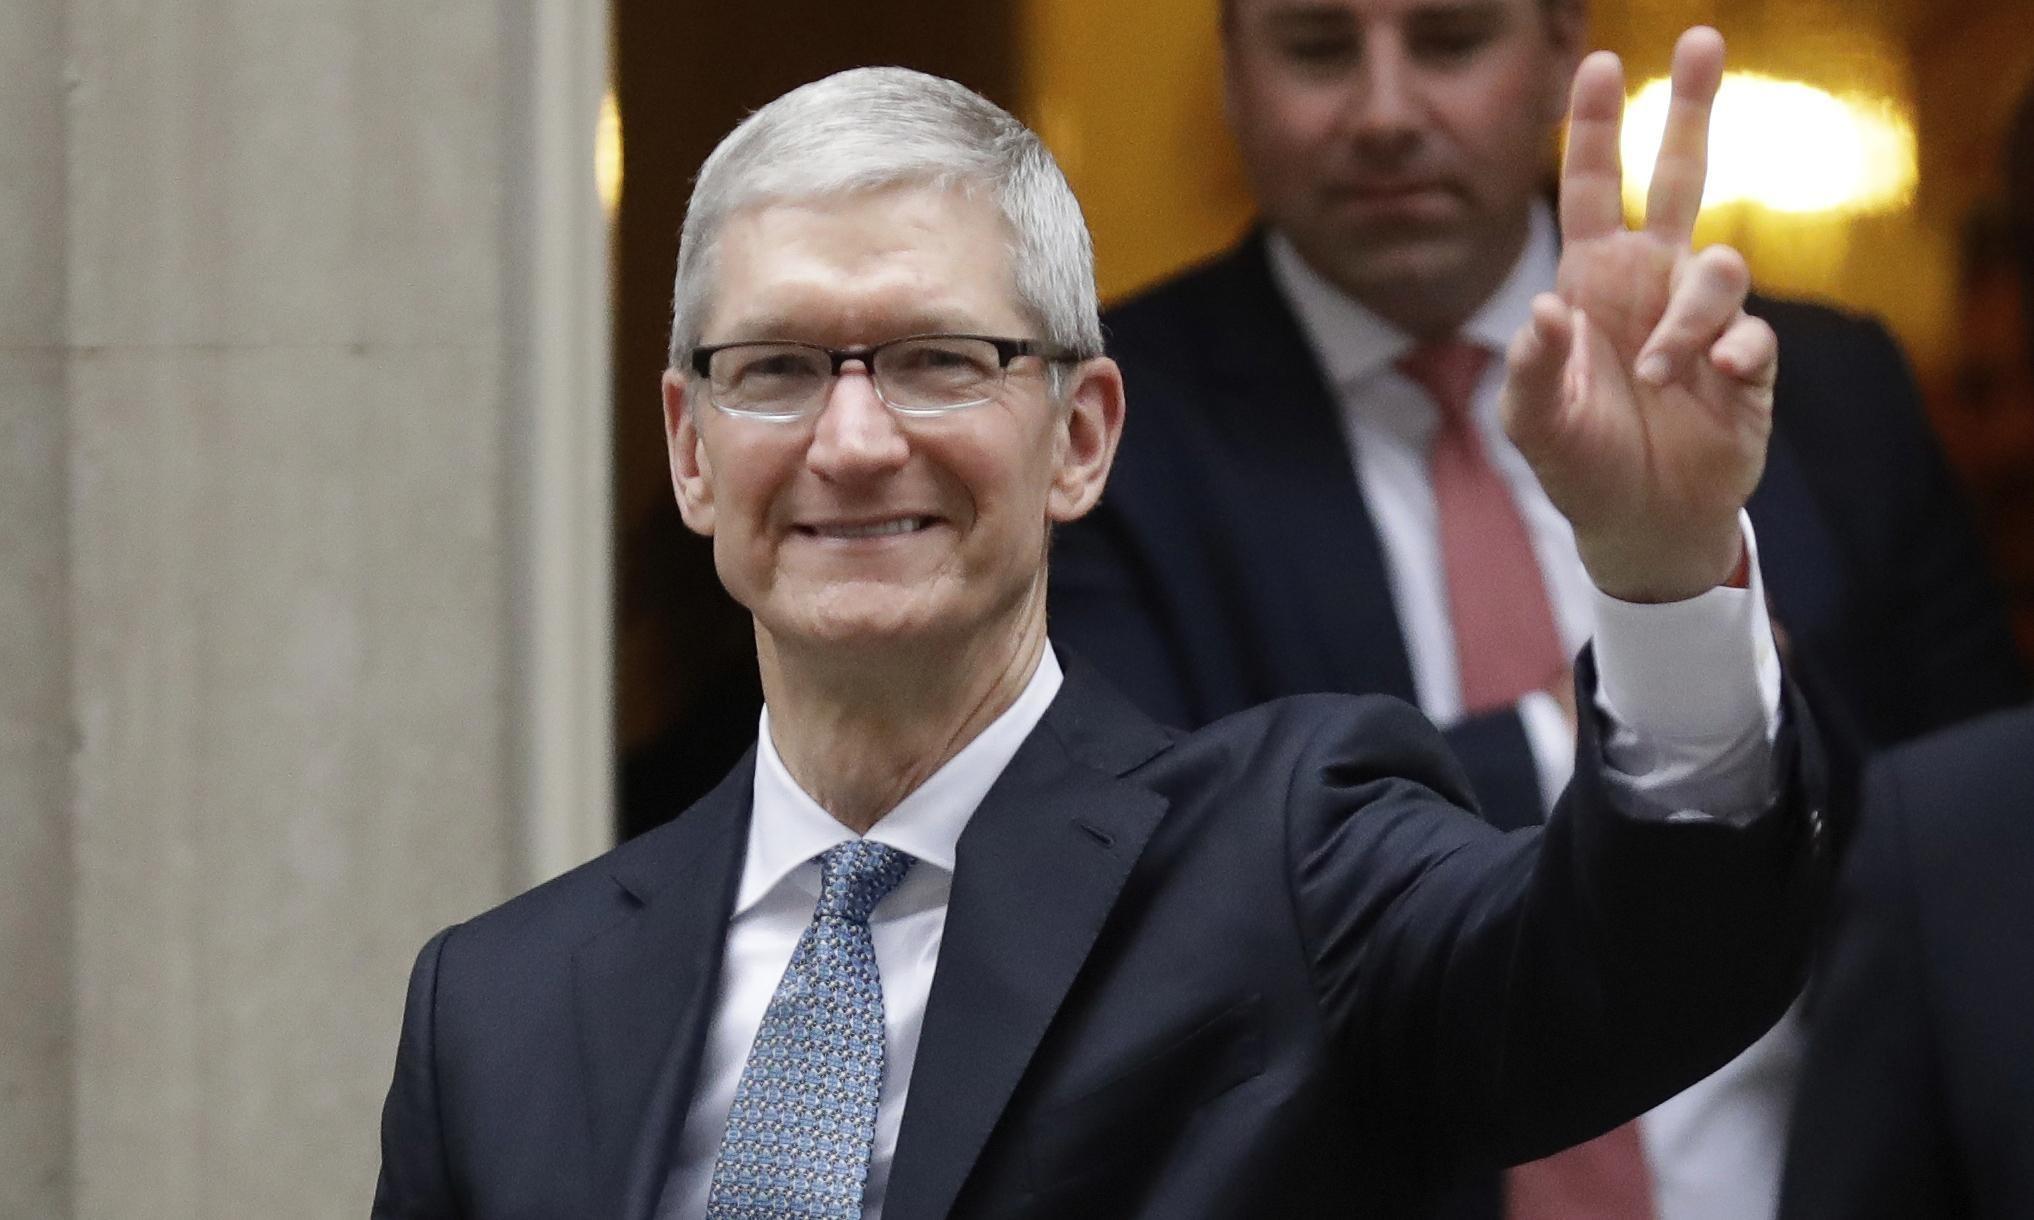 Apple denounces neo-Nazis as Spotify bans 'white power' tracks